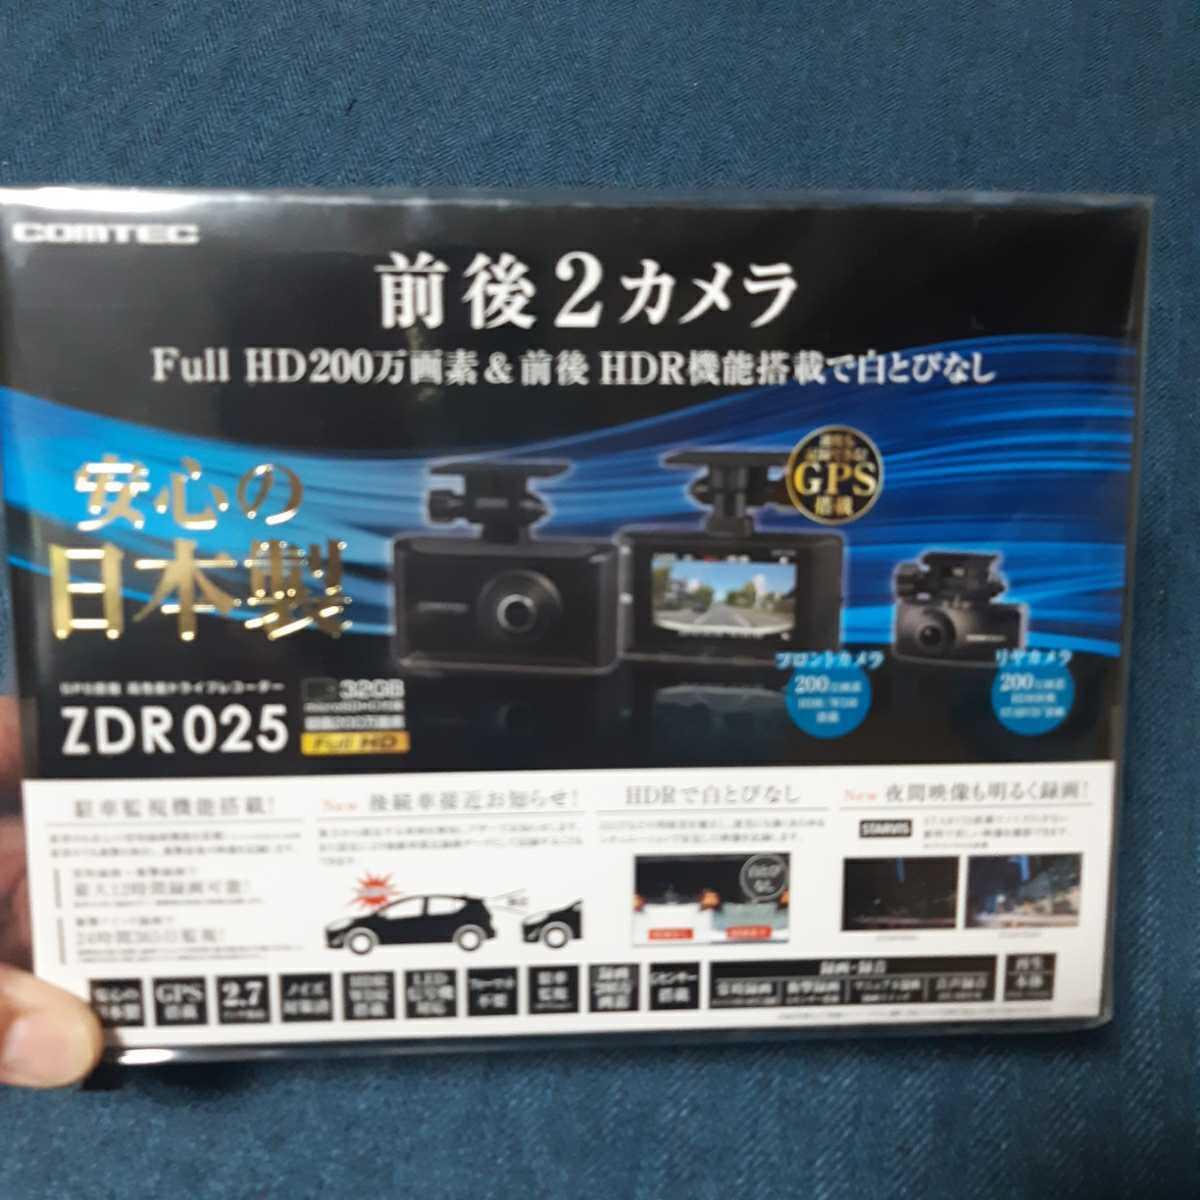 Zdr025 コムテック ZDR025、ZDR025P、コムテックどれを買えばよいか、コムテックドラレコ、コムテックドラレコレビュー